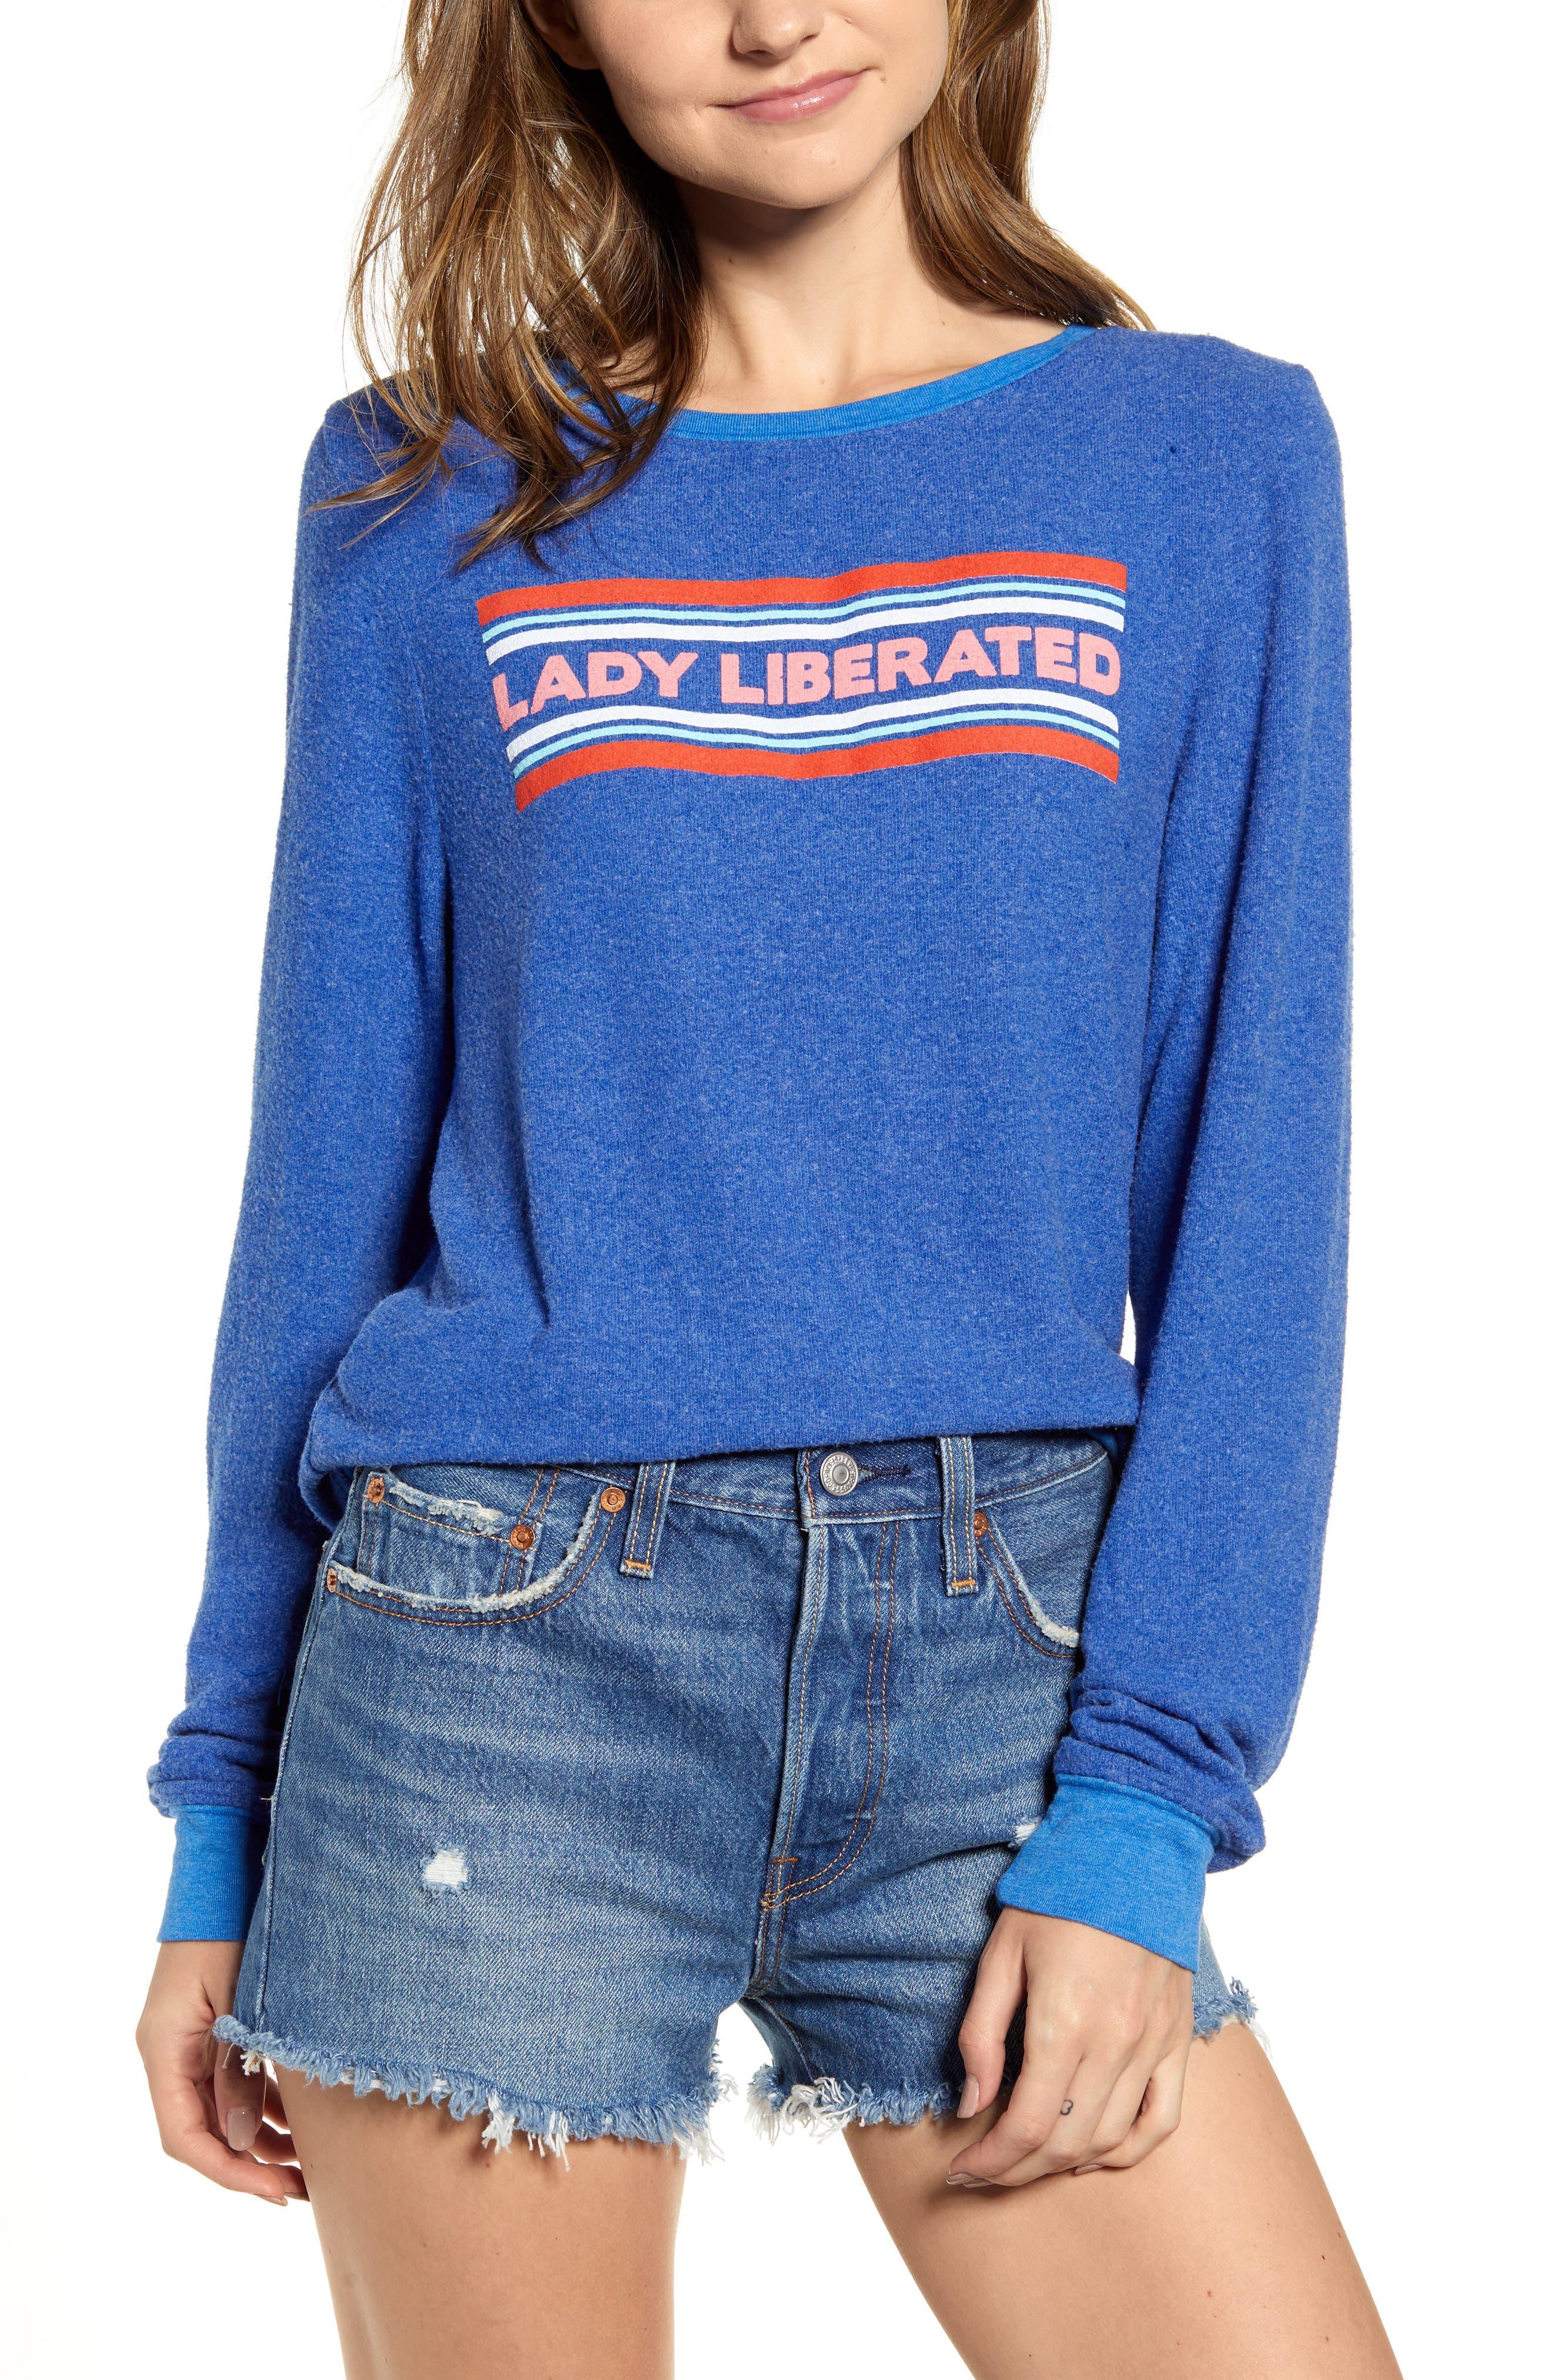 Wildfox Lady Liberated Baggy Beach Jumper Sweatshirt, Blue